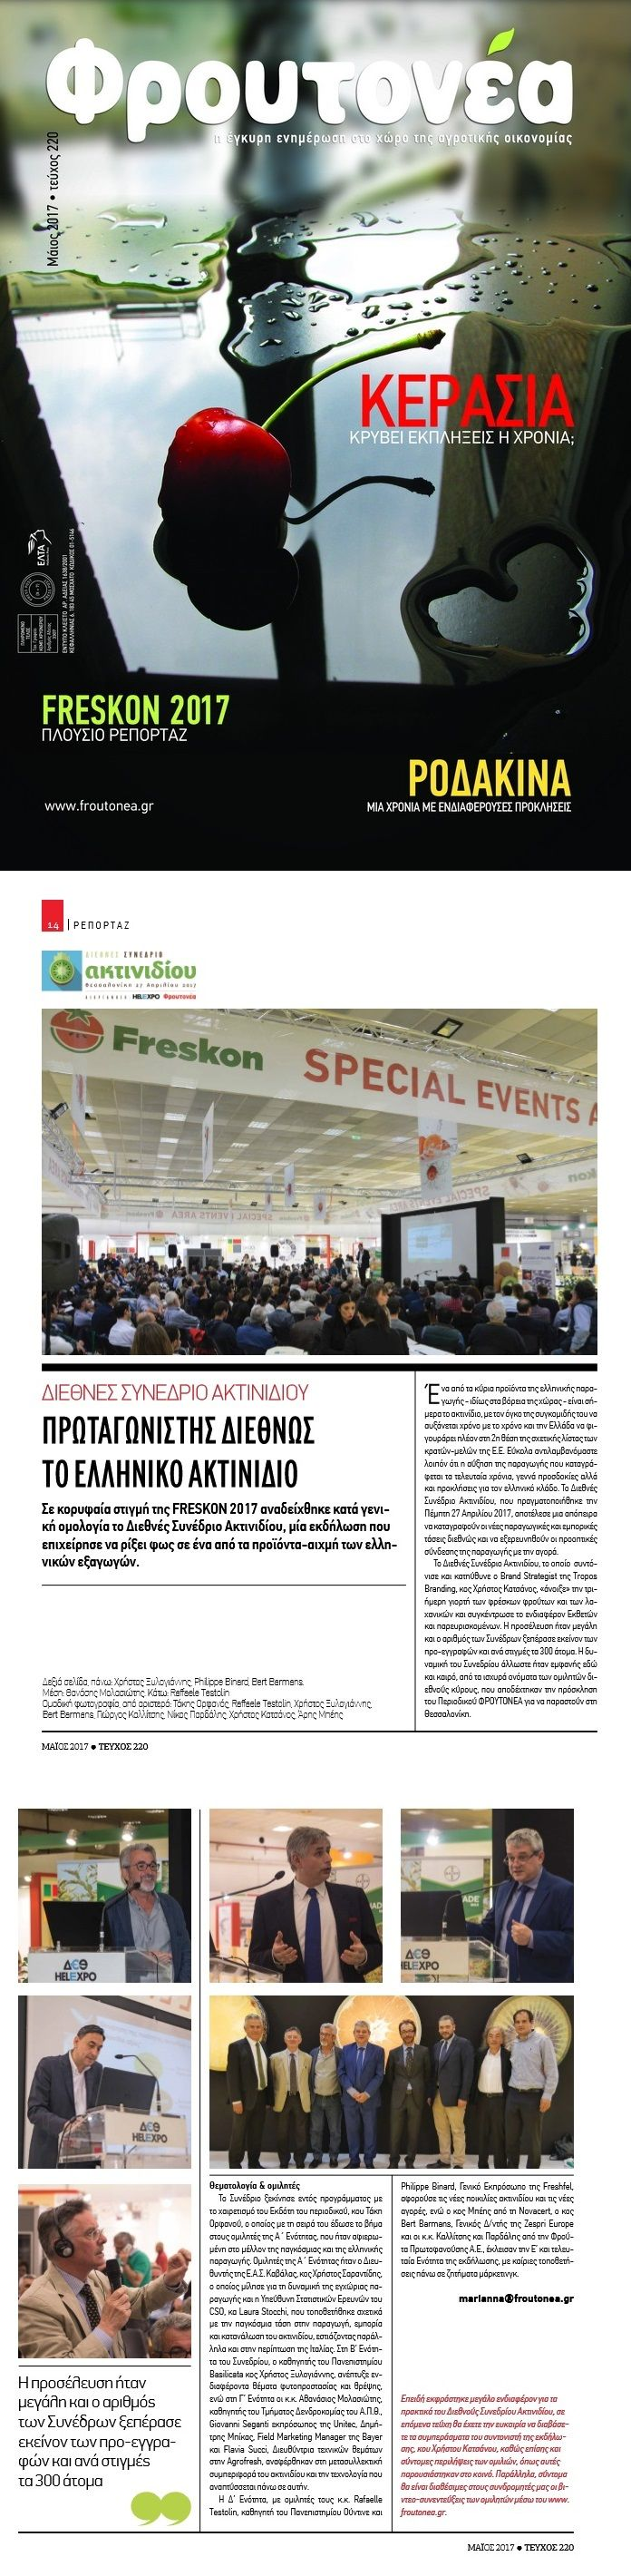 Froutonea - May 2017 - Int'l Kiwi Congress_Freskon 2017